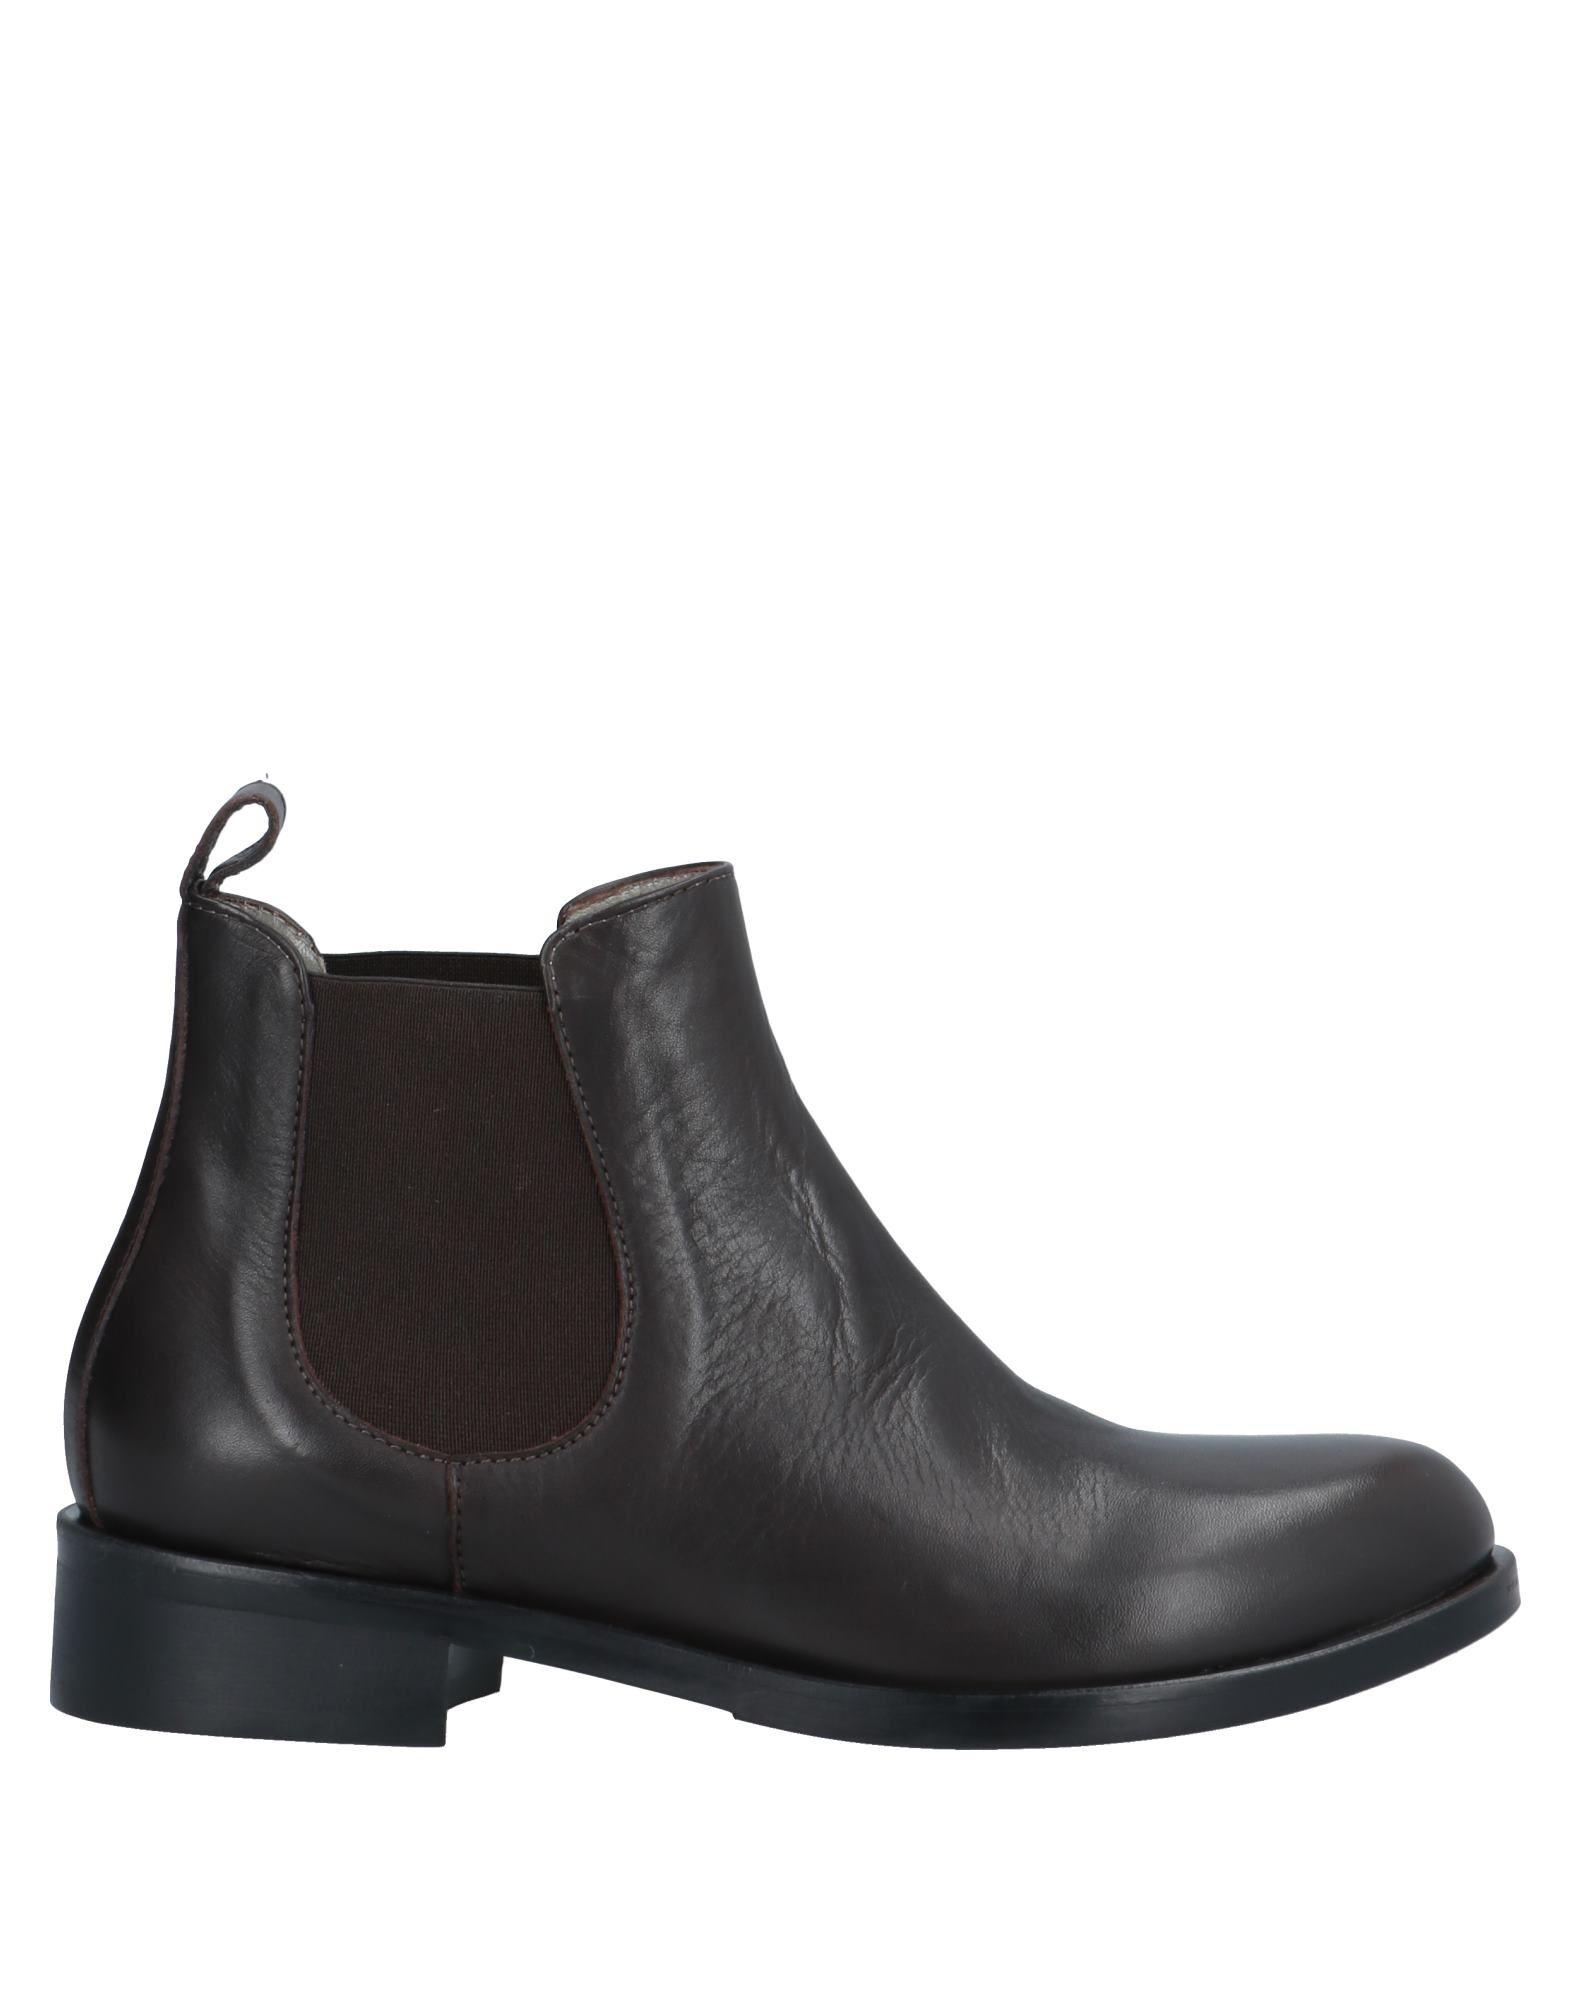 MR MASSIMO REBECCHI Полусапоги и высокие ботинки